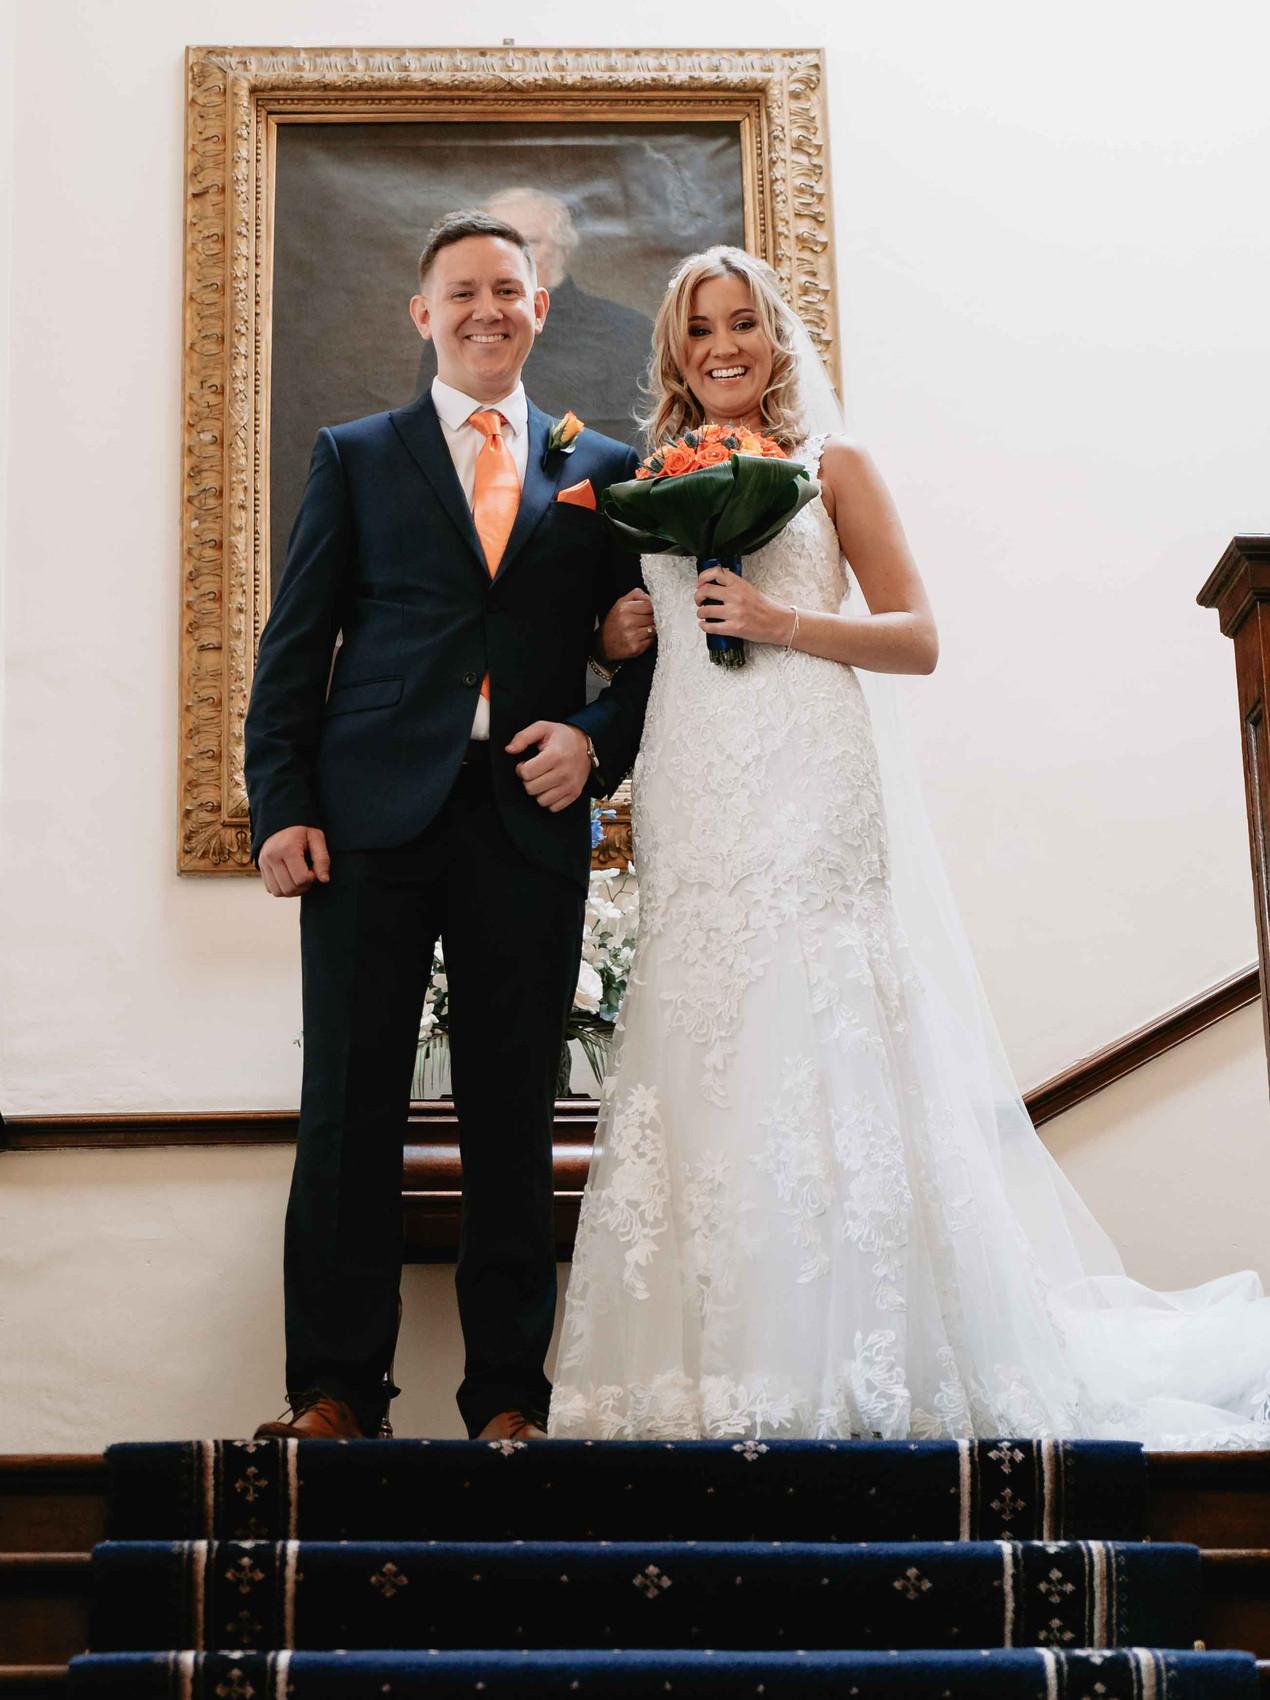 Wedding Photos Ideas at Clearwell Castle Wedding Venue Gloucestershire